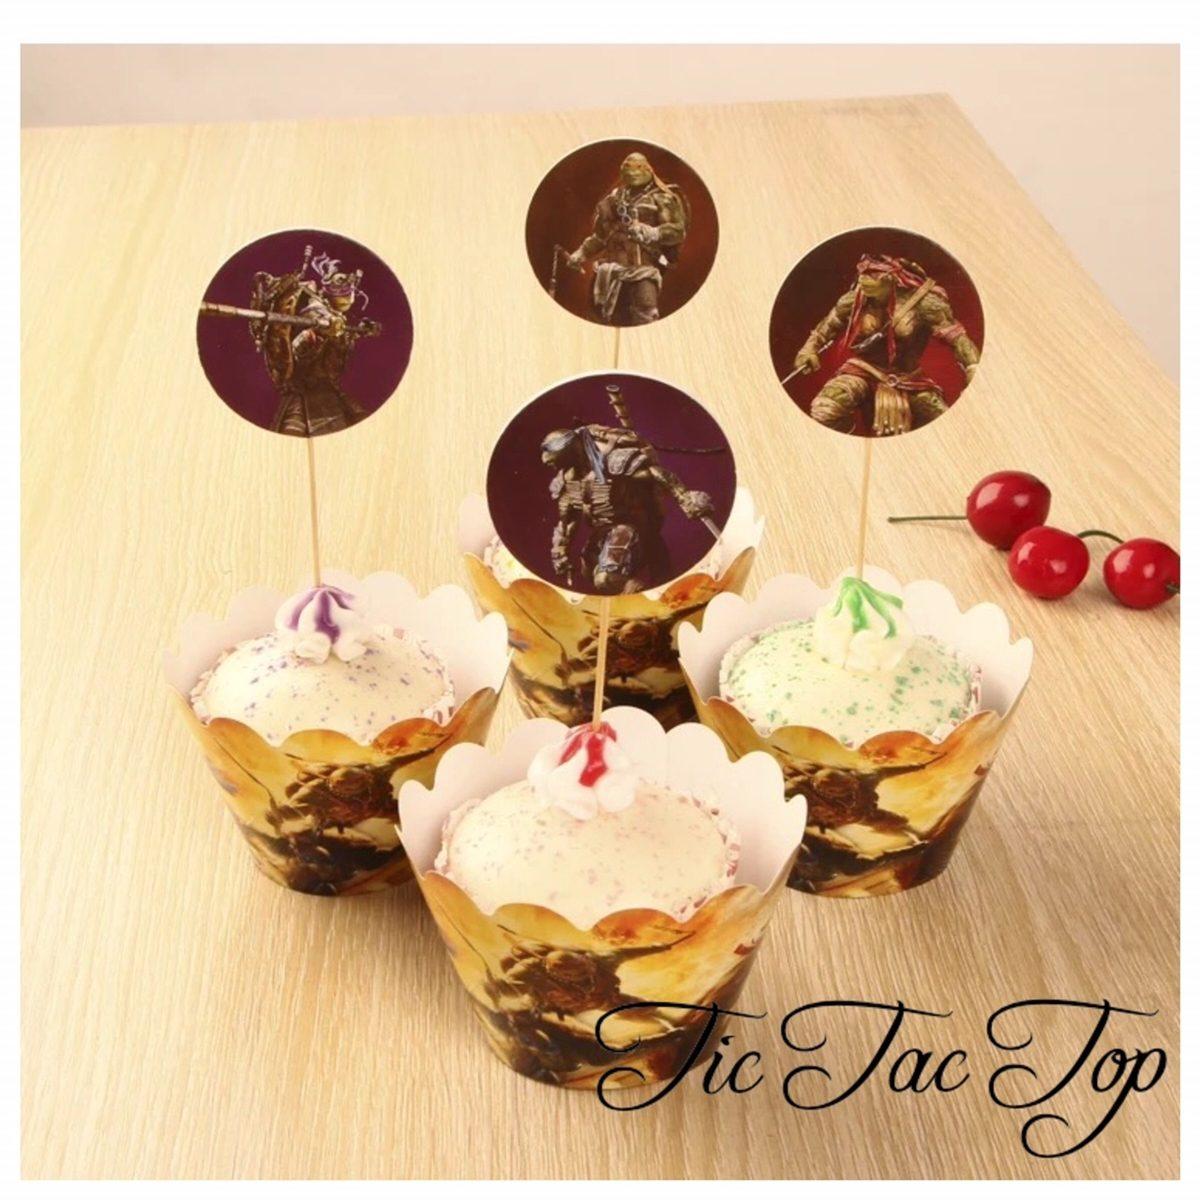 Teenage Mutant Ninja Turtle Cupcake Wrappers + Toppers